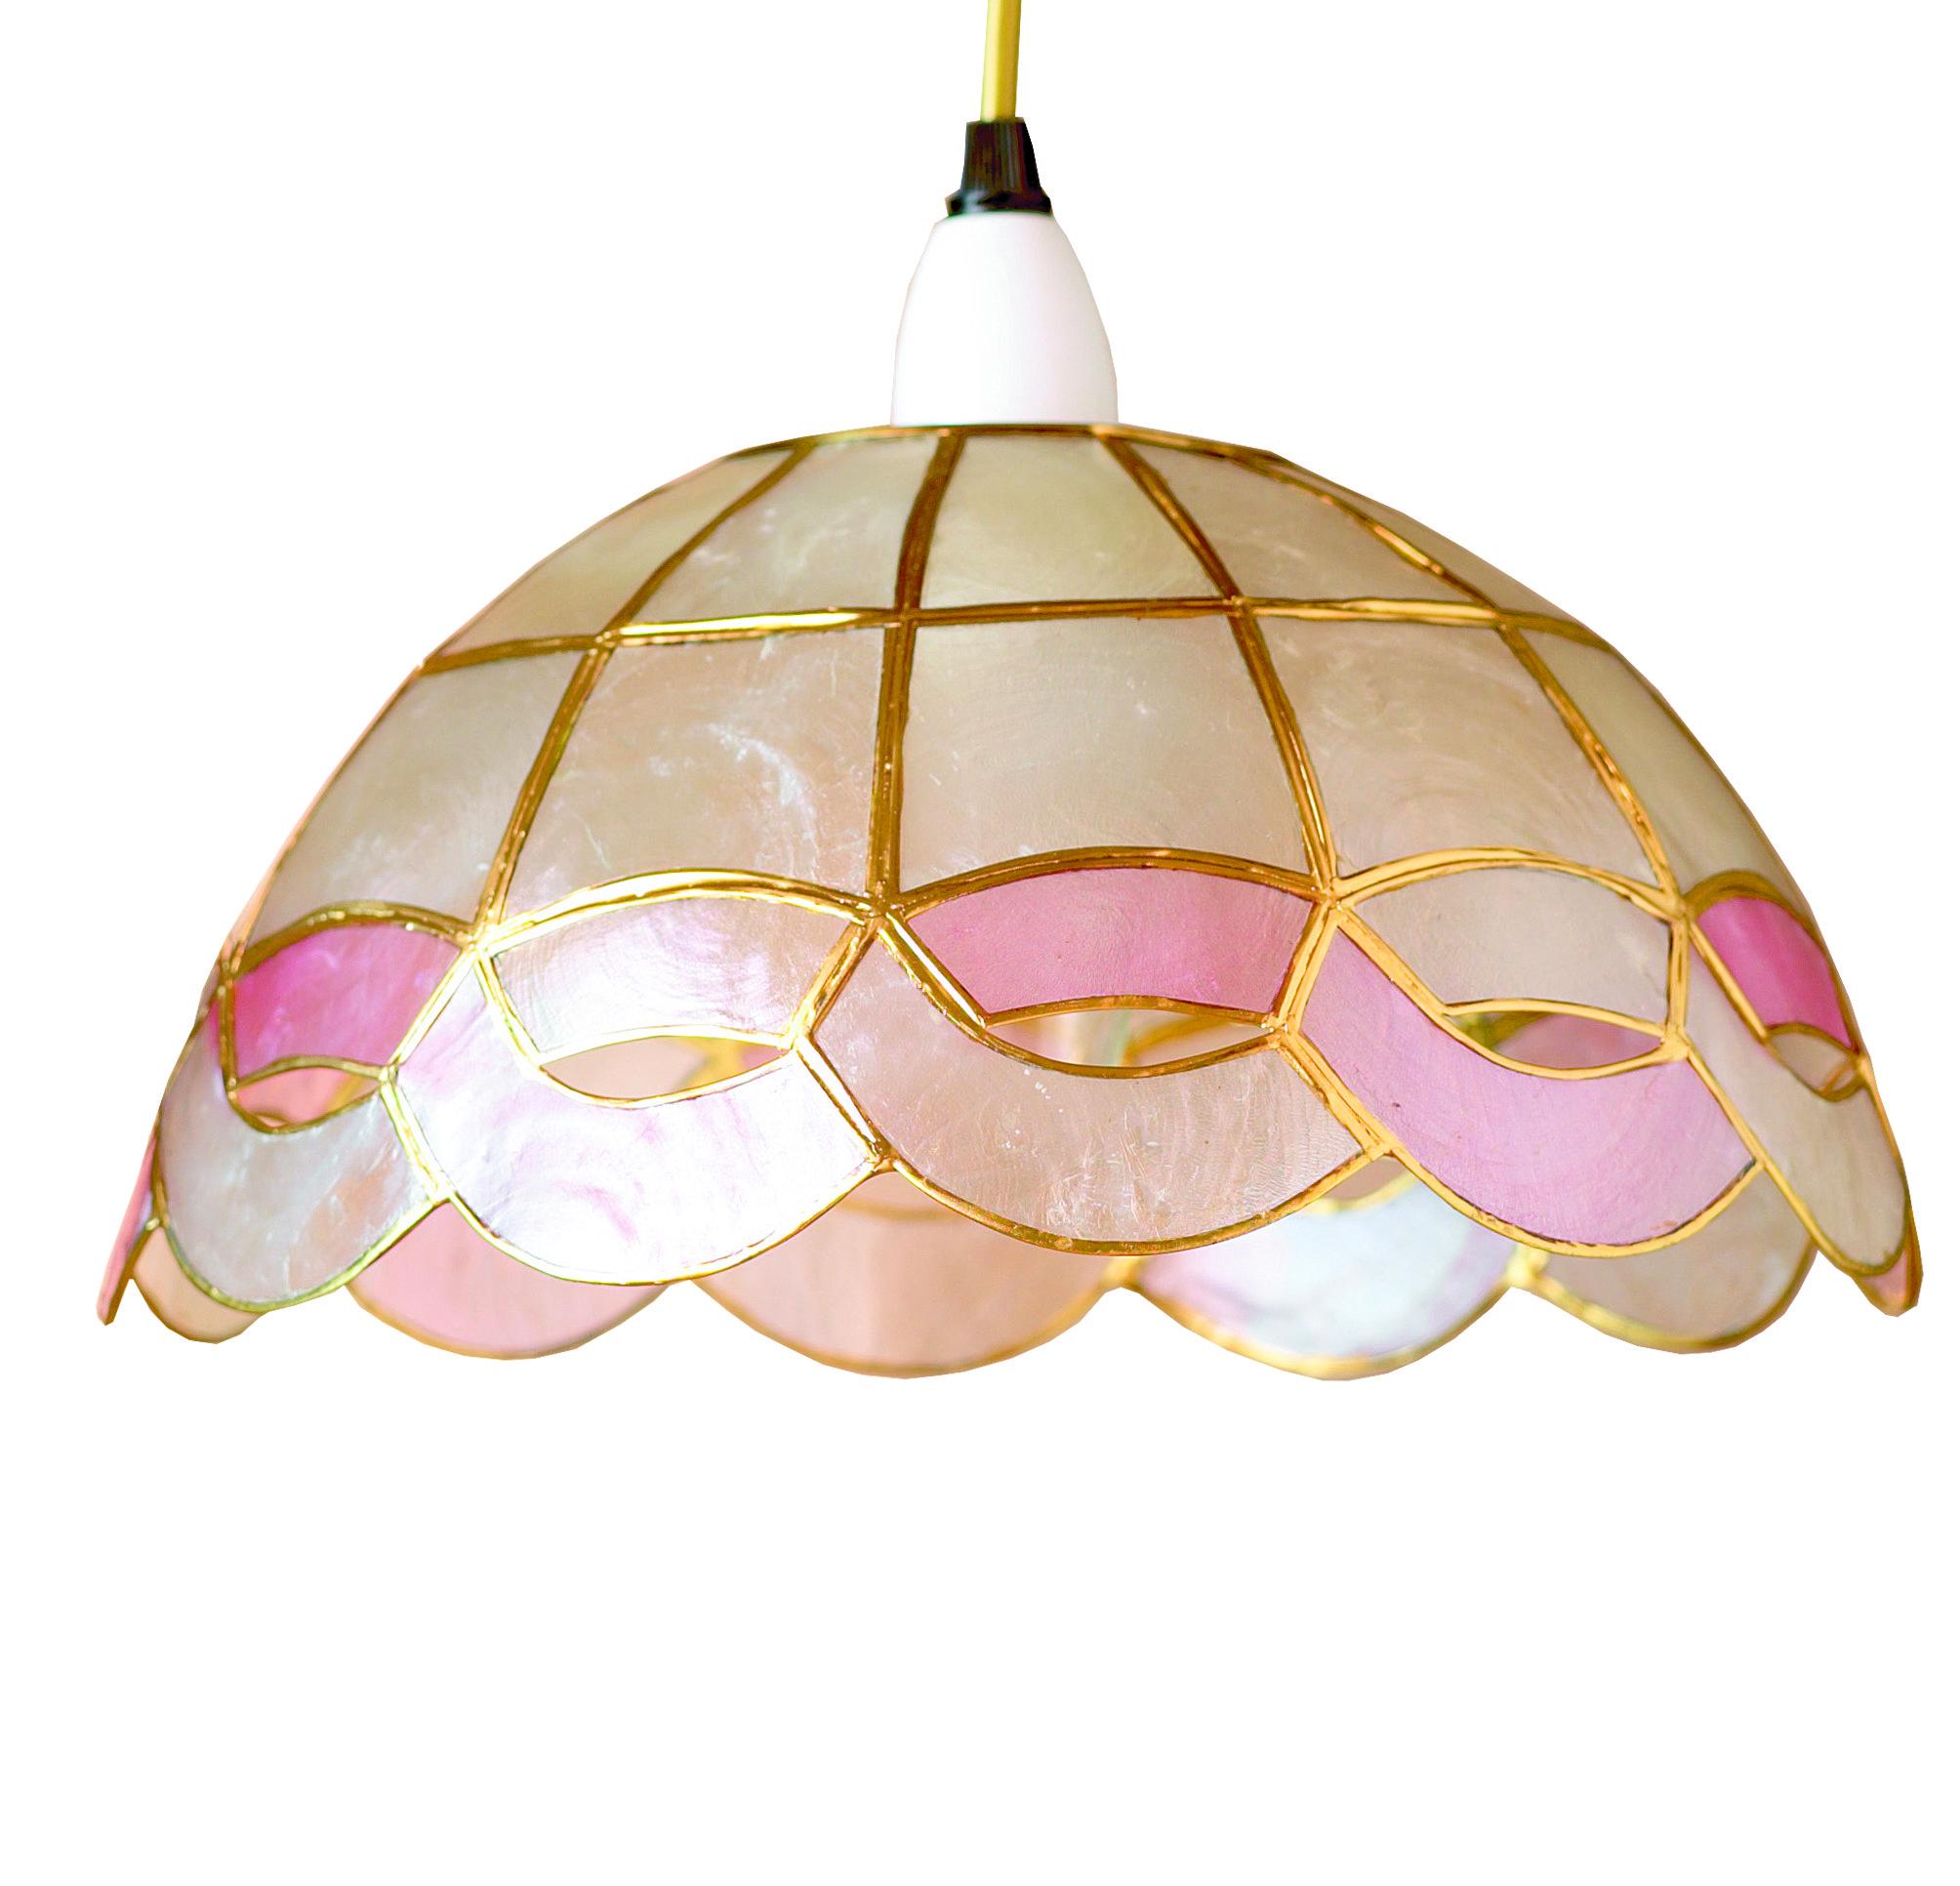 lighting garden free light lamp capiz inch overstock safavieh illumina floors product shipping floor today home